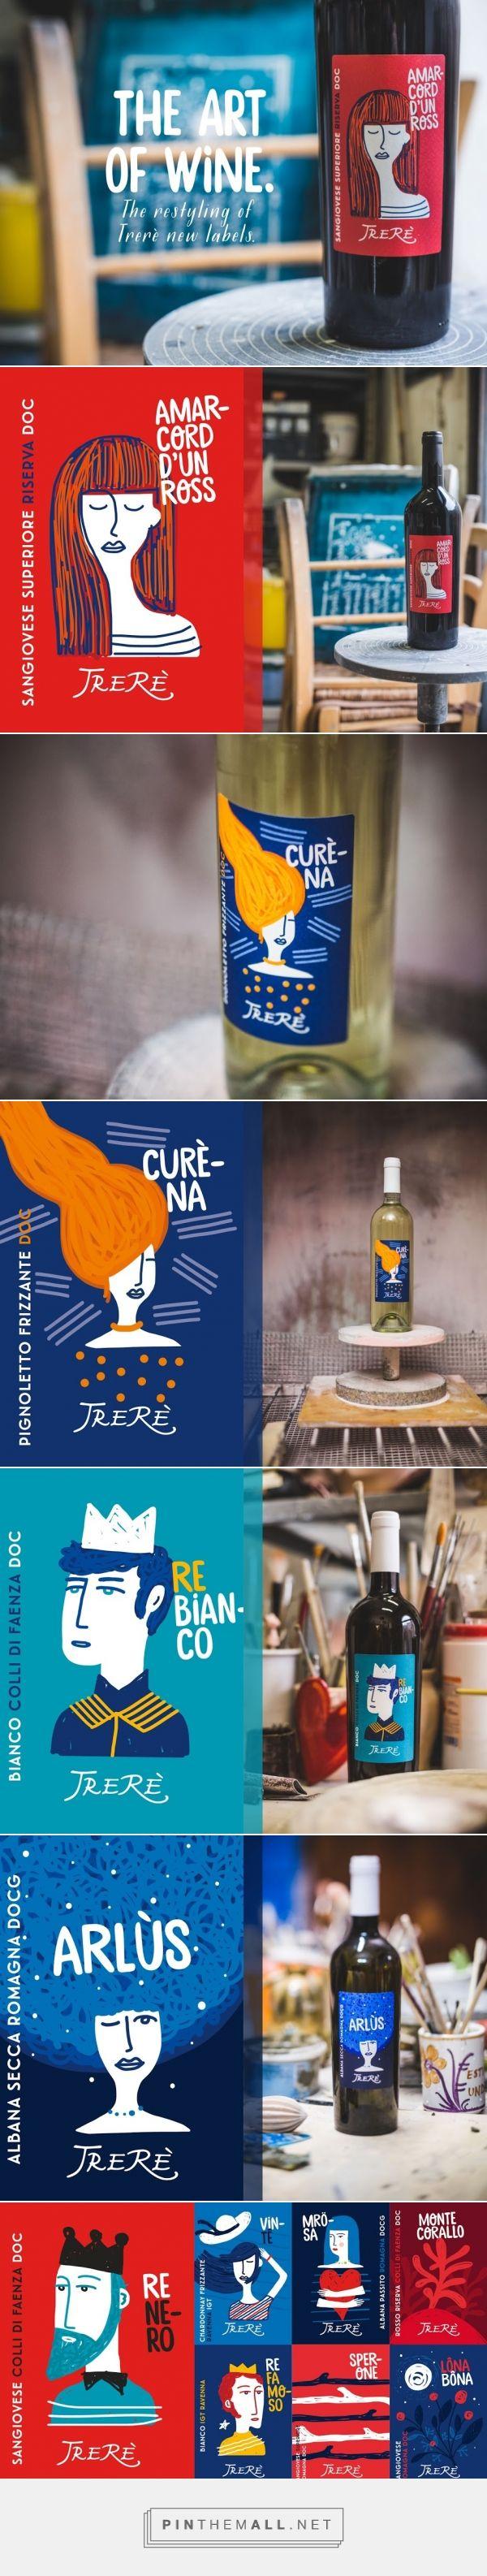 Trerè Wine - Packaging of the World - Creative Package Design Gallery - http://www.packagingoftheworld.com/2016/03/trere-wine.html